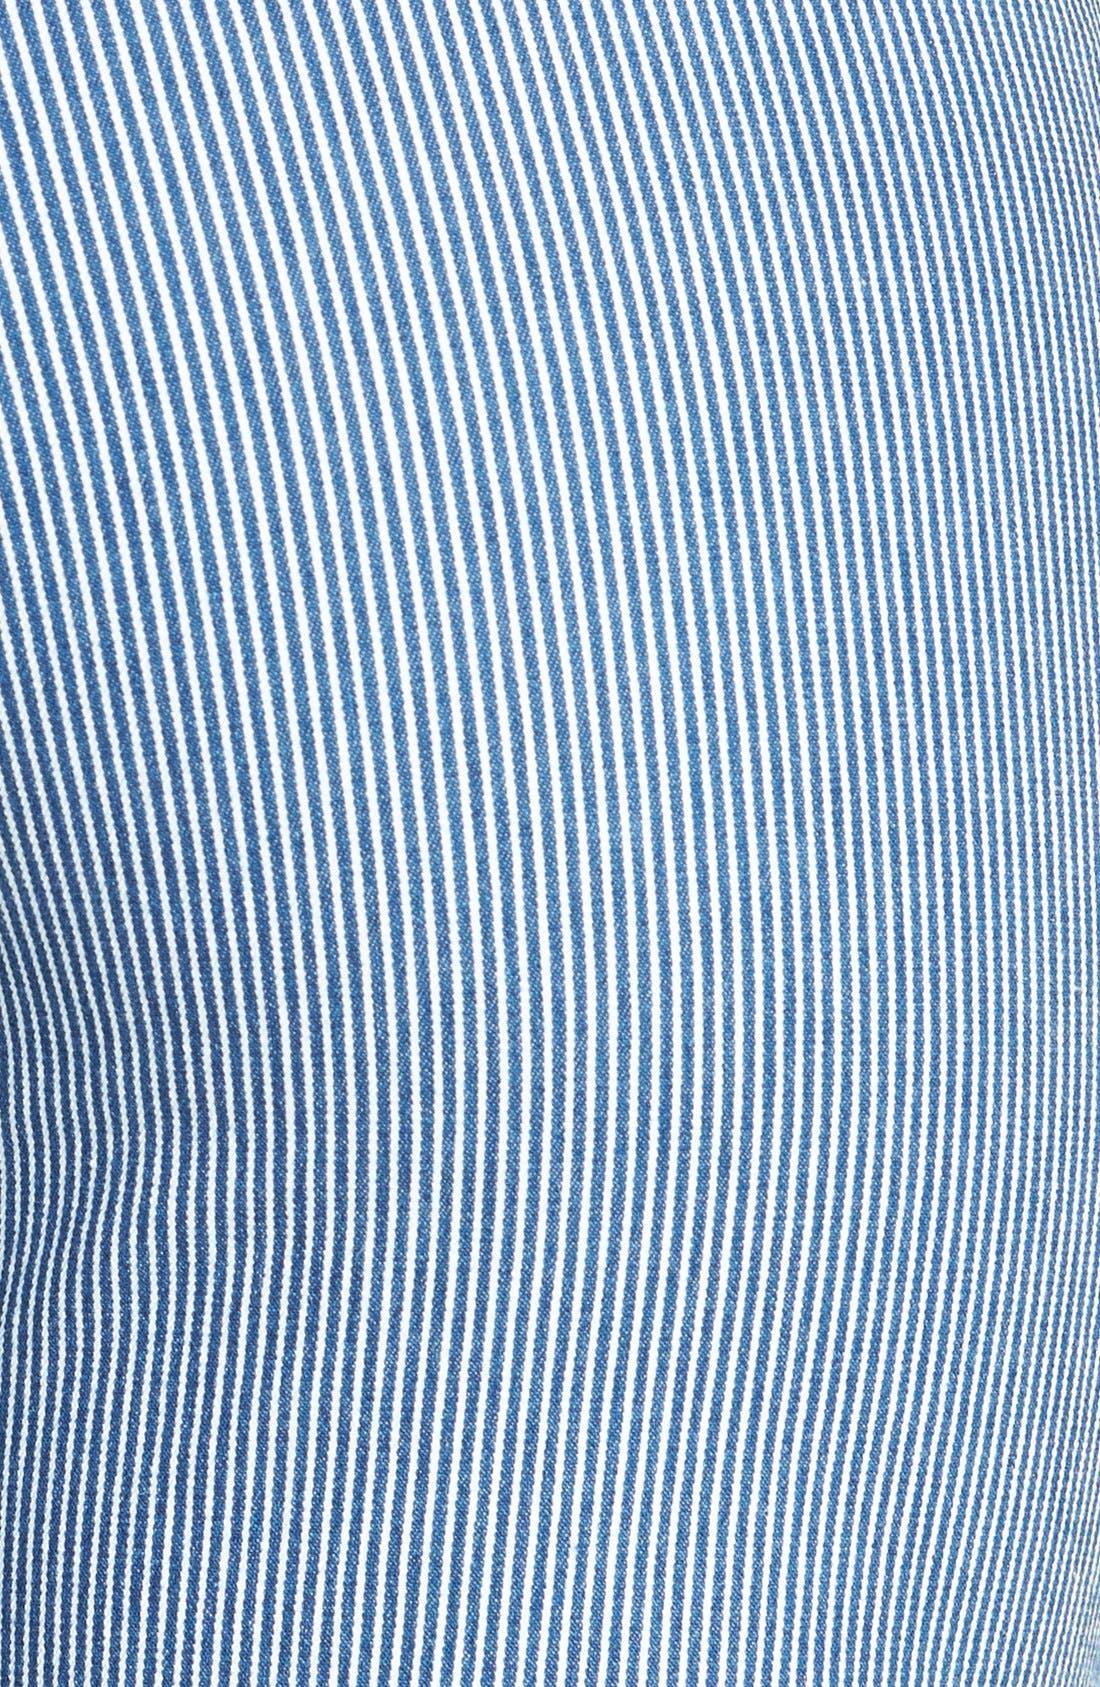 Alternate Image 3  - NYDJ 'Brianna' Stretch Denim Bermuda Shorts